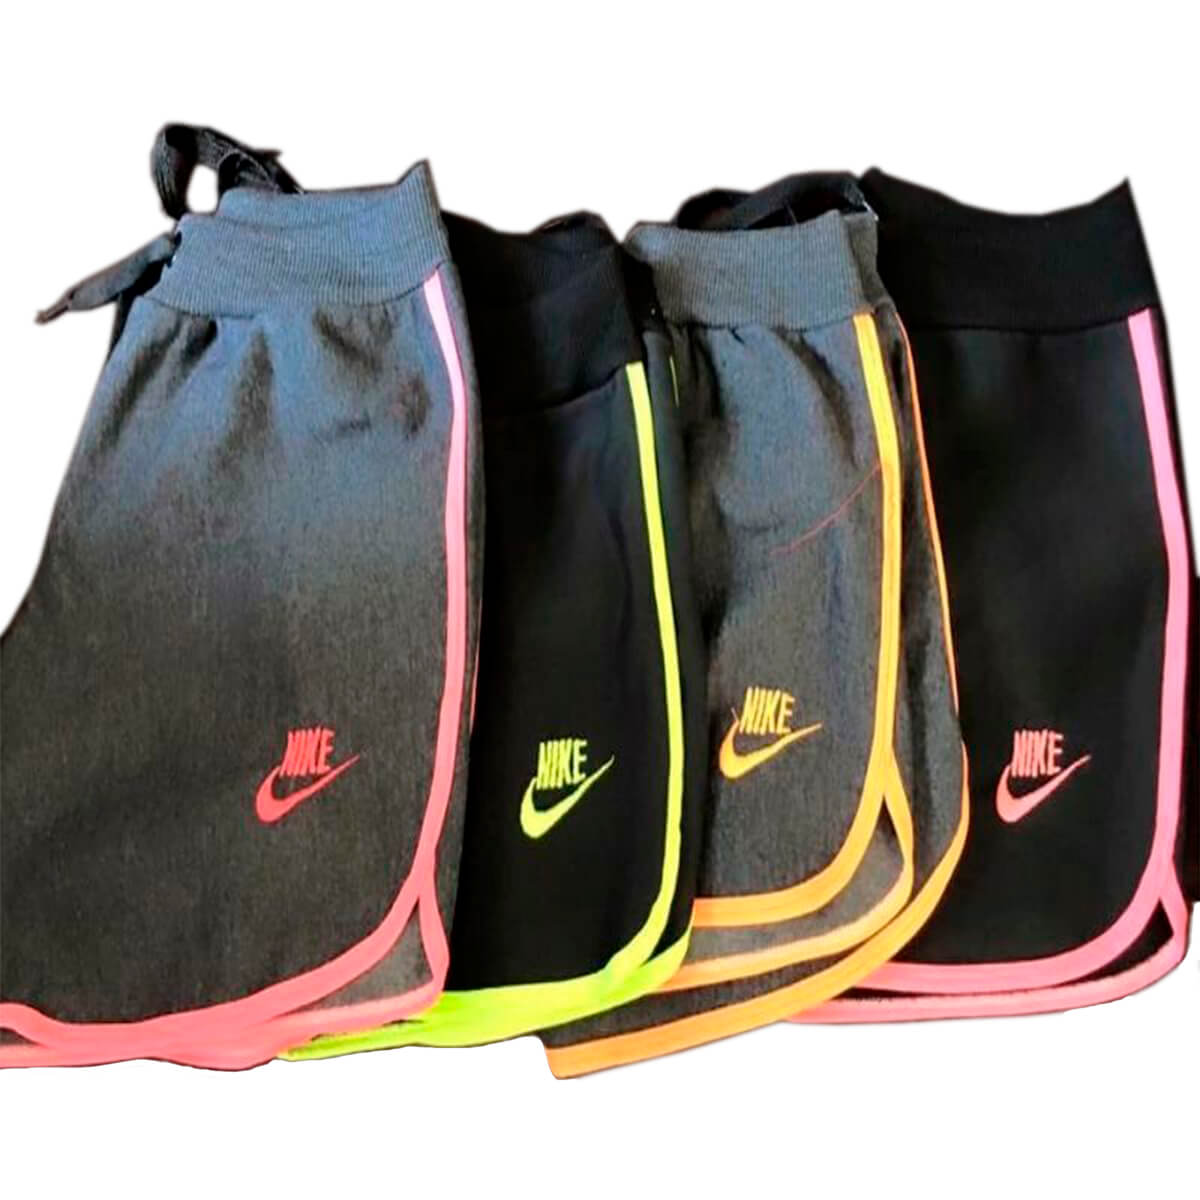 Kit 50 Shorts Moletom Feminino Nike Magazinshop Roupas